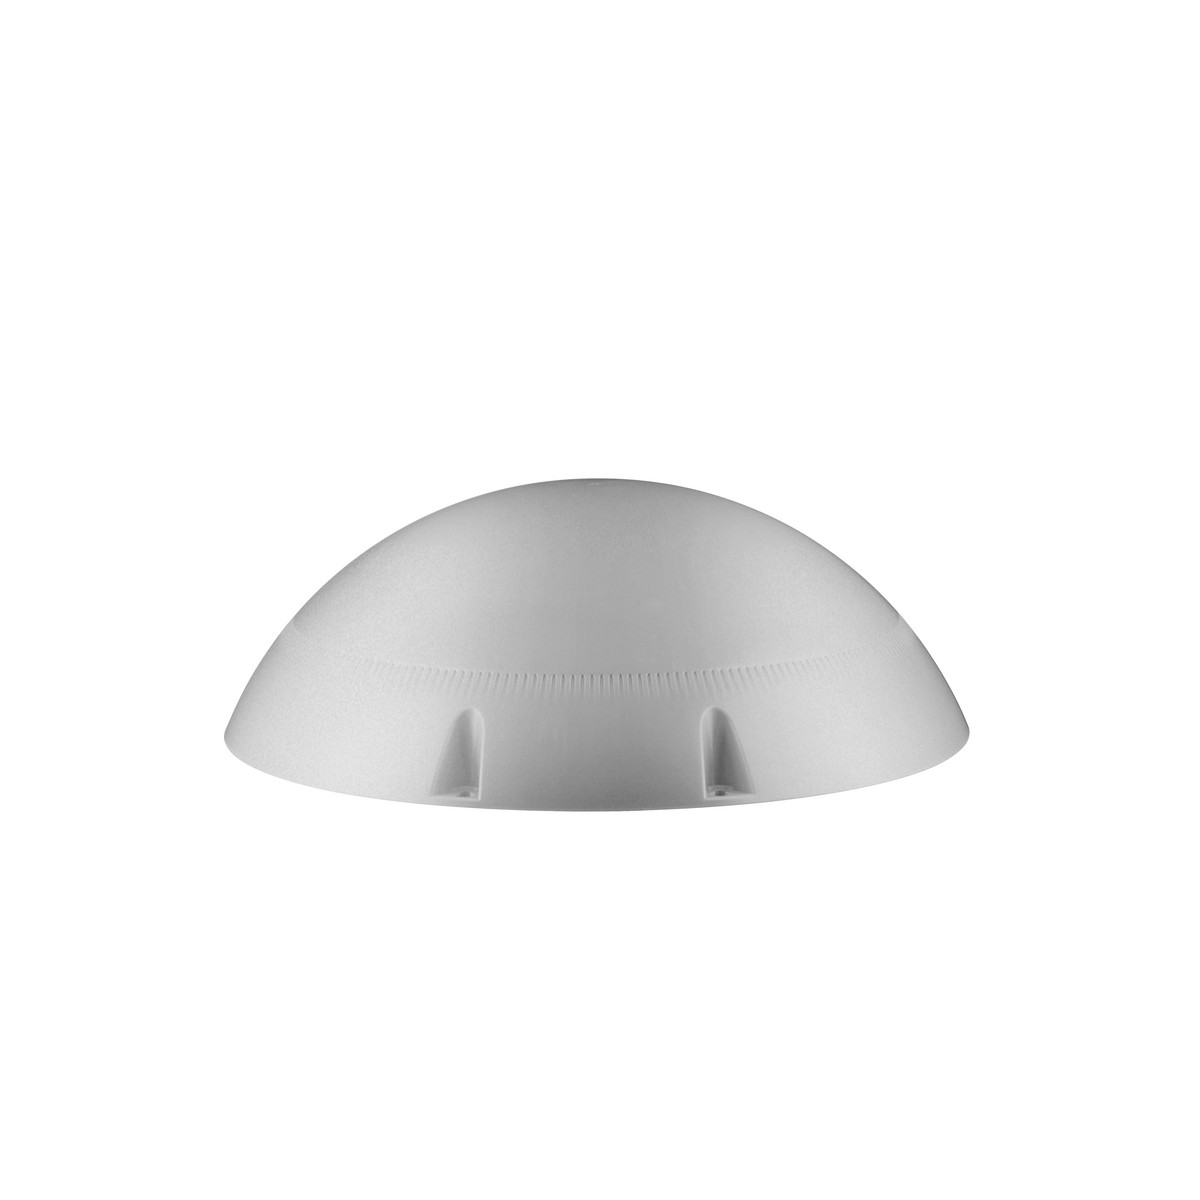 Philips TownTune tilbehør ZDP263 Dekorativ top dome Lys grå